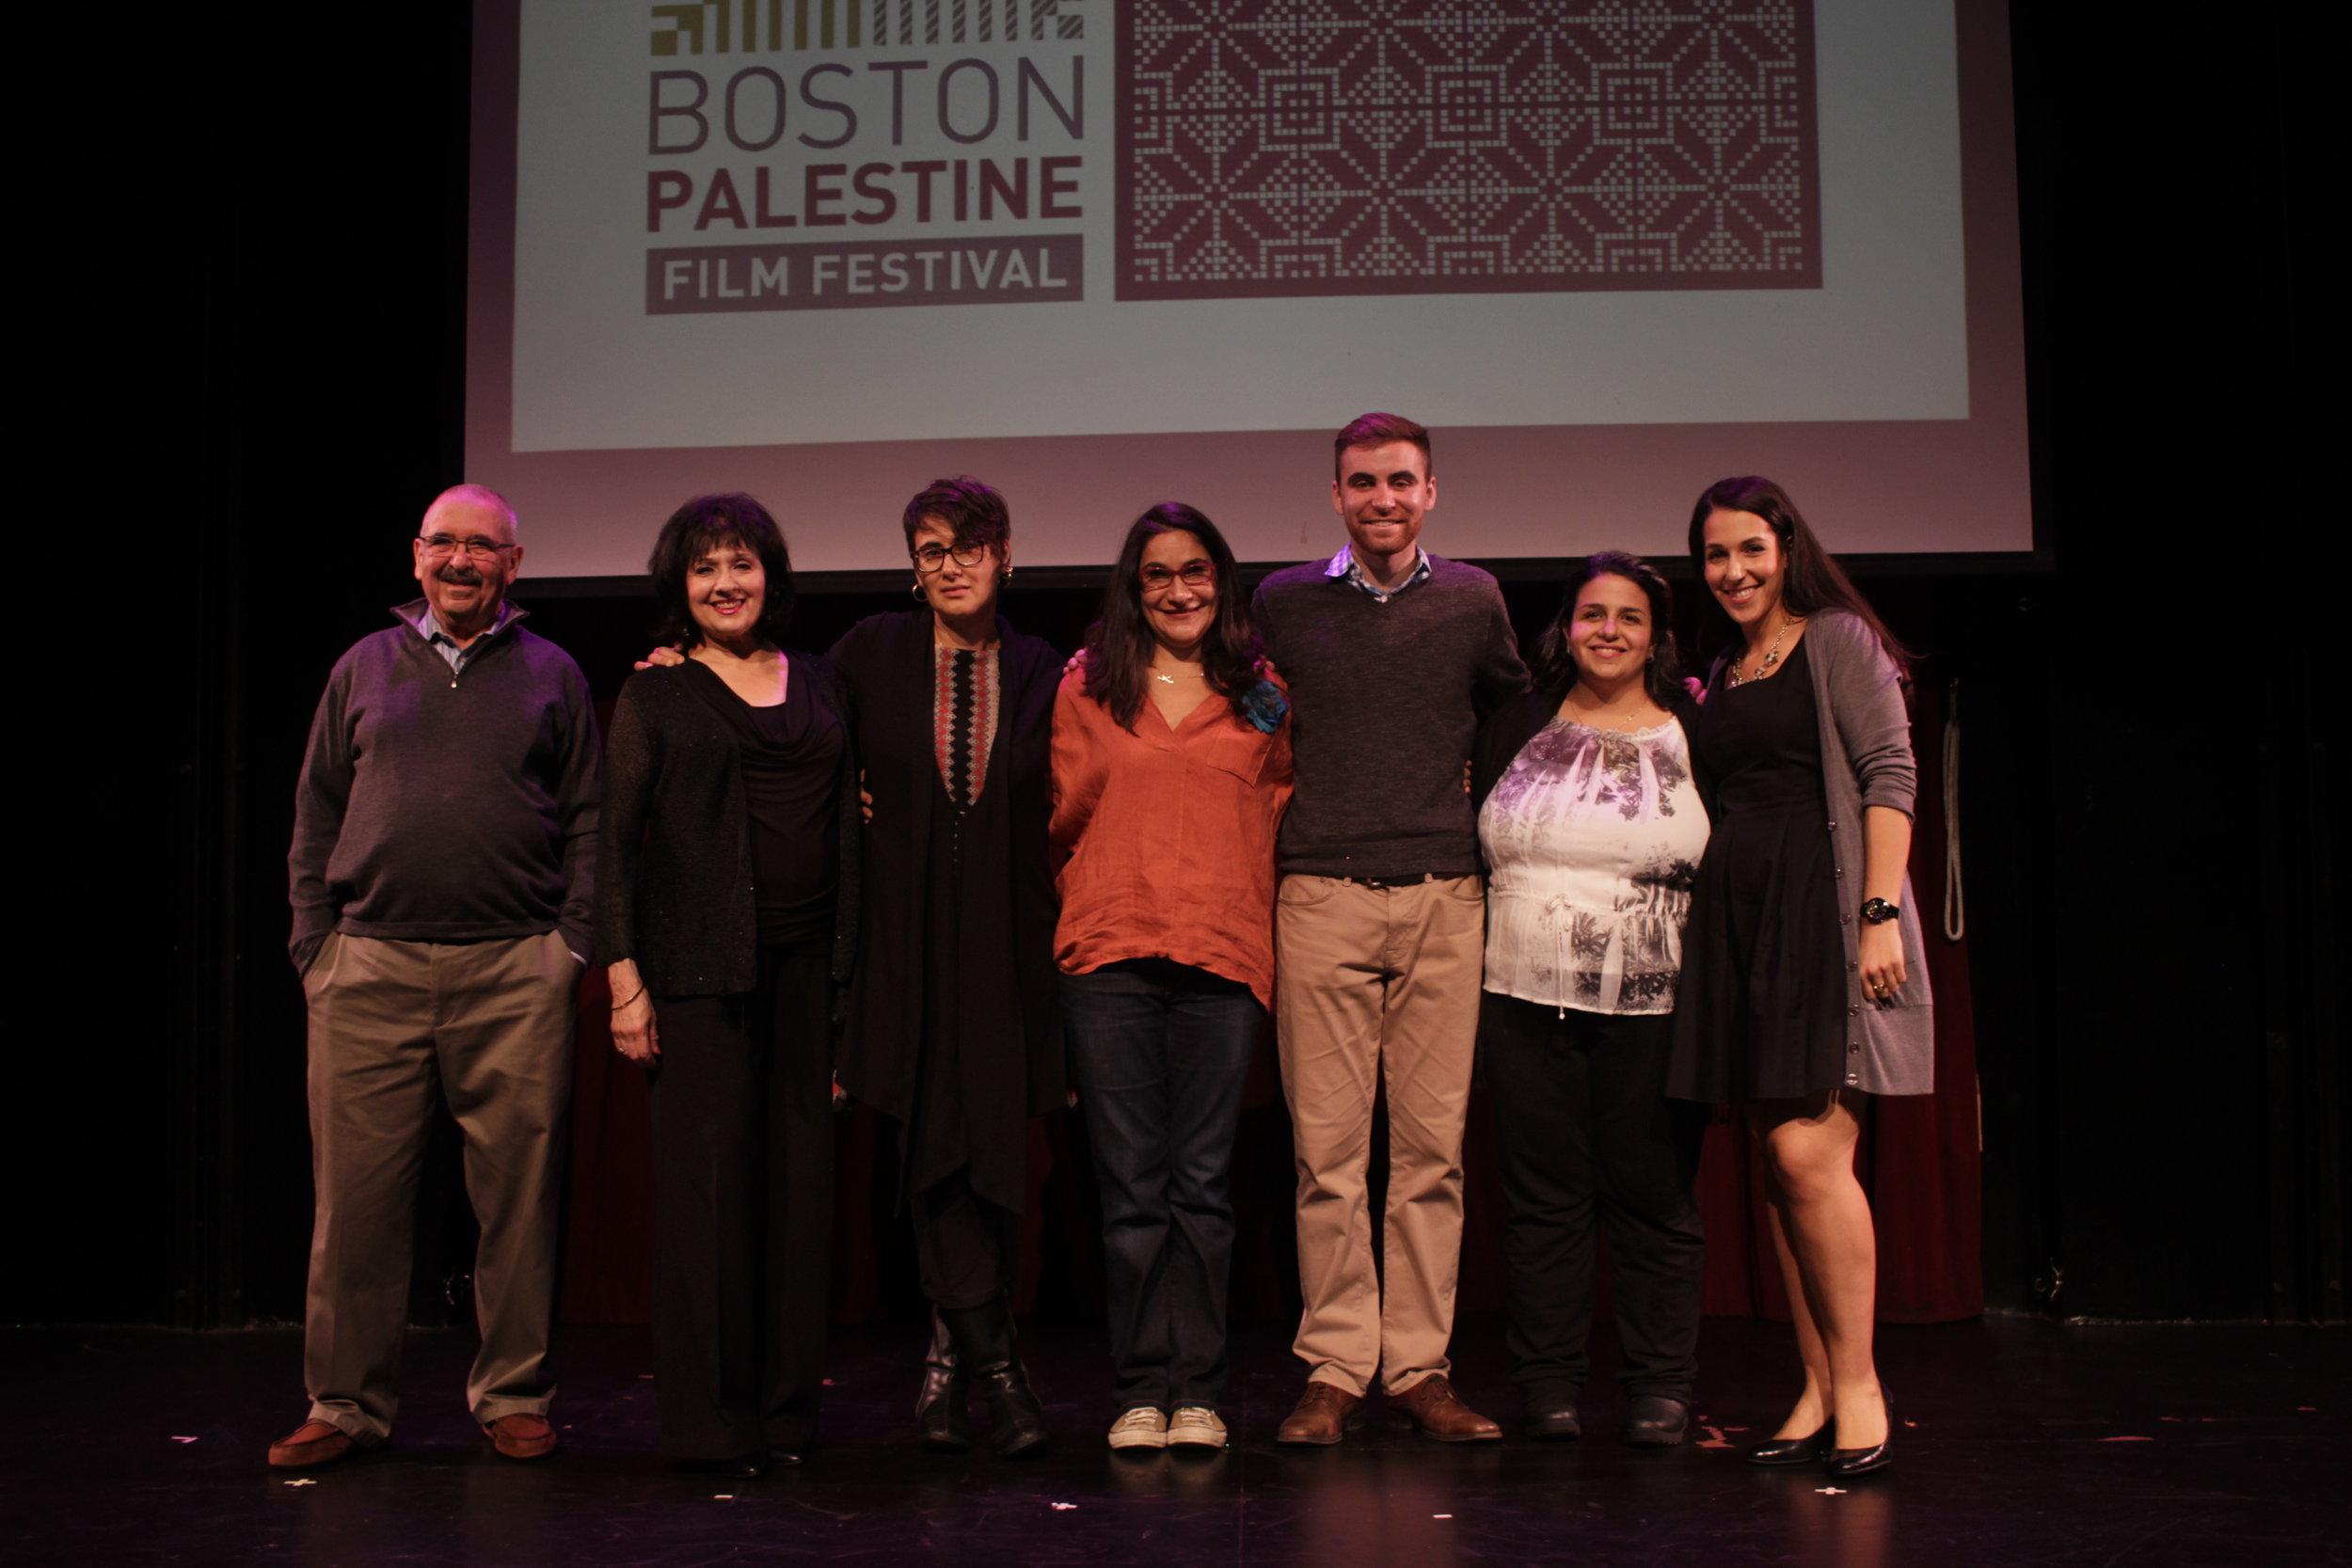 Palestinians, Live! BostonOctober 23, 2016, Oberon TheaterCambridge, MAIn collaboration with the Boston Palestine Film Festival. - Storytellers: Nijmeh Curren, Dana Sajdi, Sari Abuljubein, Salma Abu-Ayyash, Hani Azzam, Gloria Olivier, and Nadia Abuelezam.